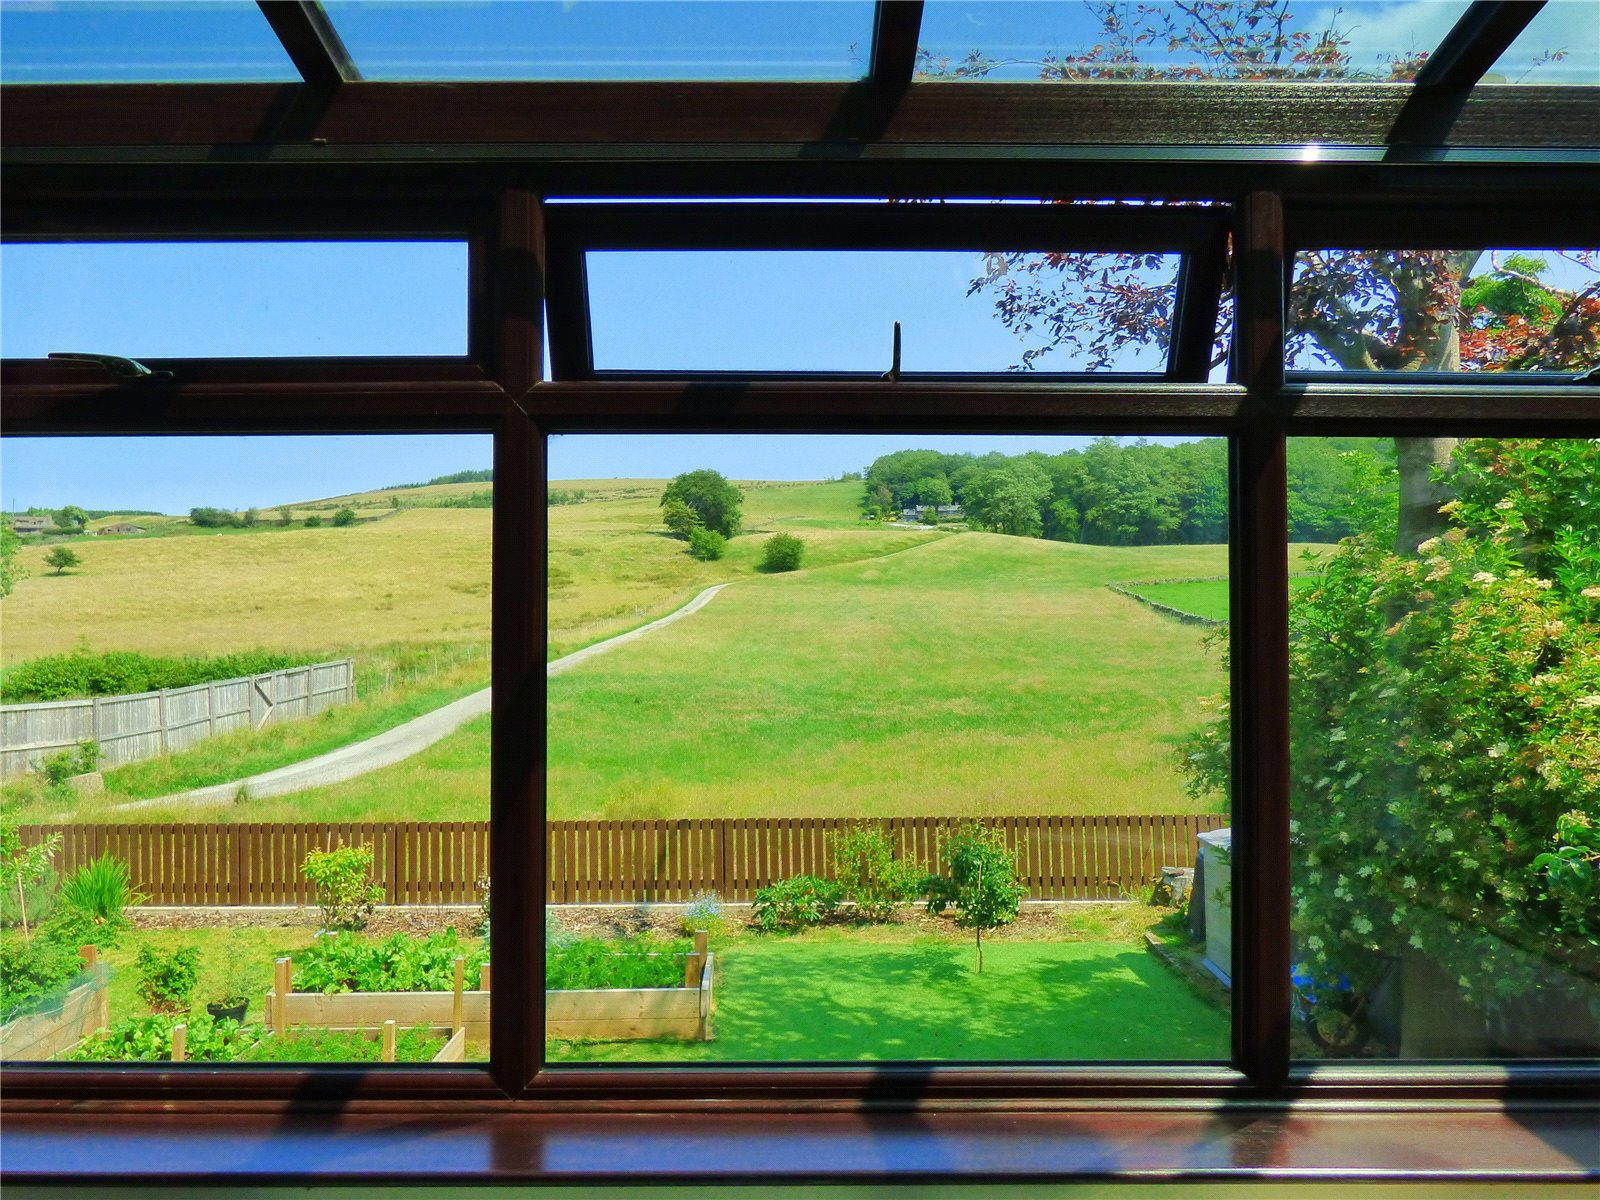 Conservatory Views: